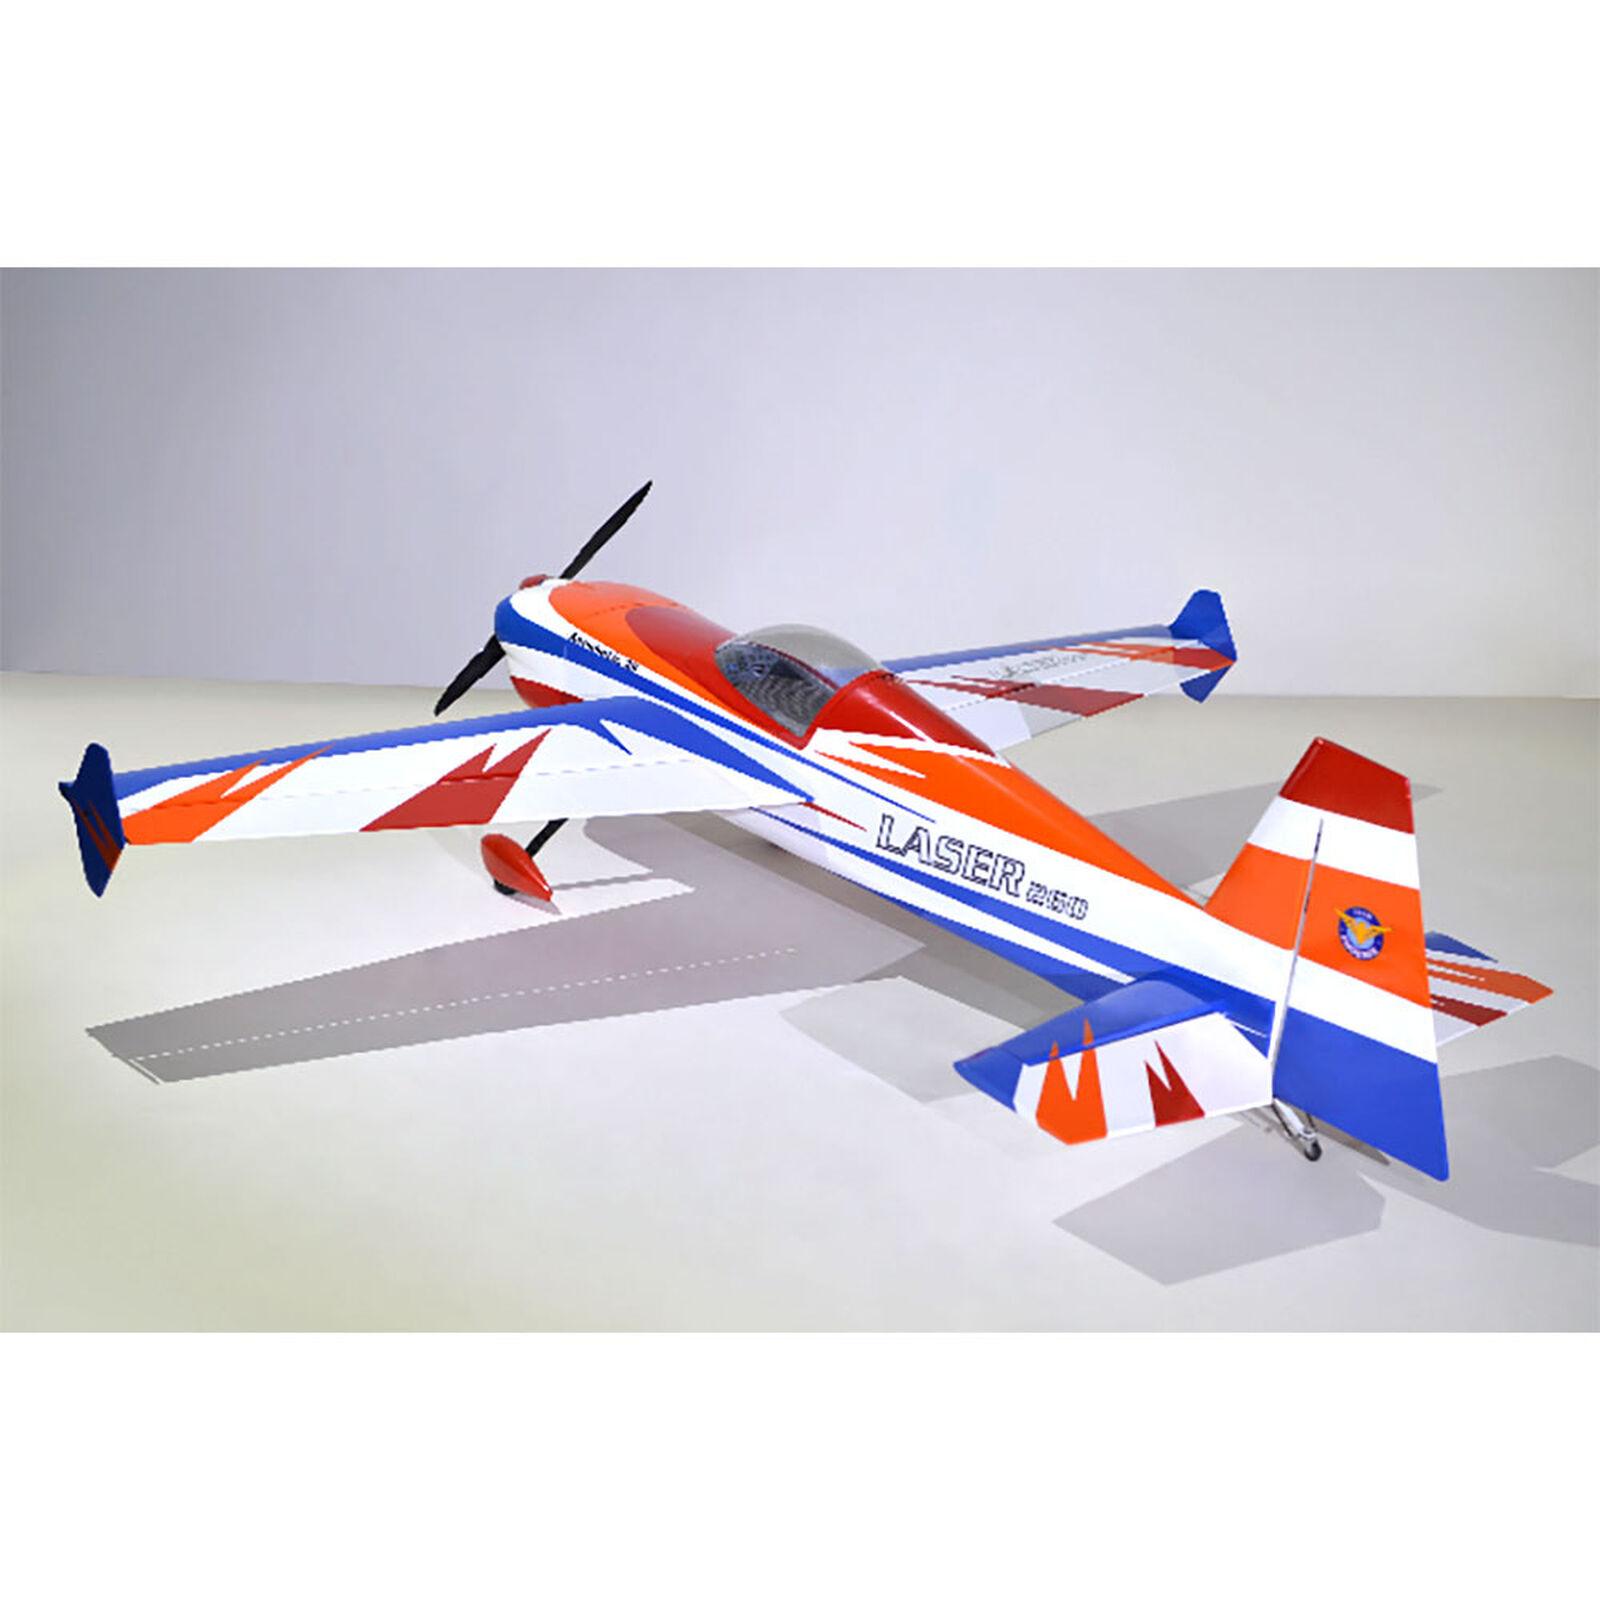 "Laser 260 Aerobat 70cc ARF 88.6"""